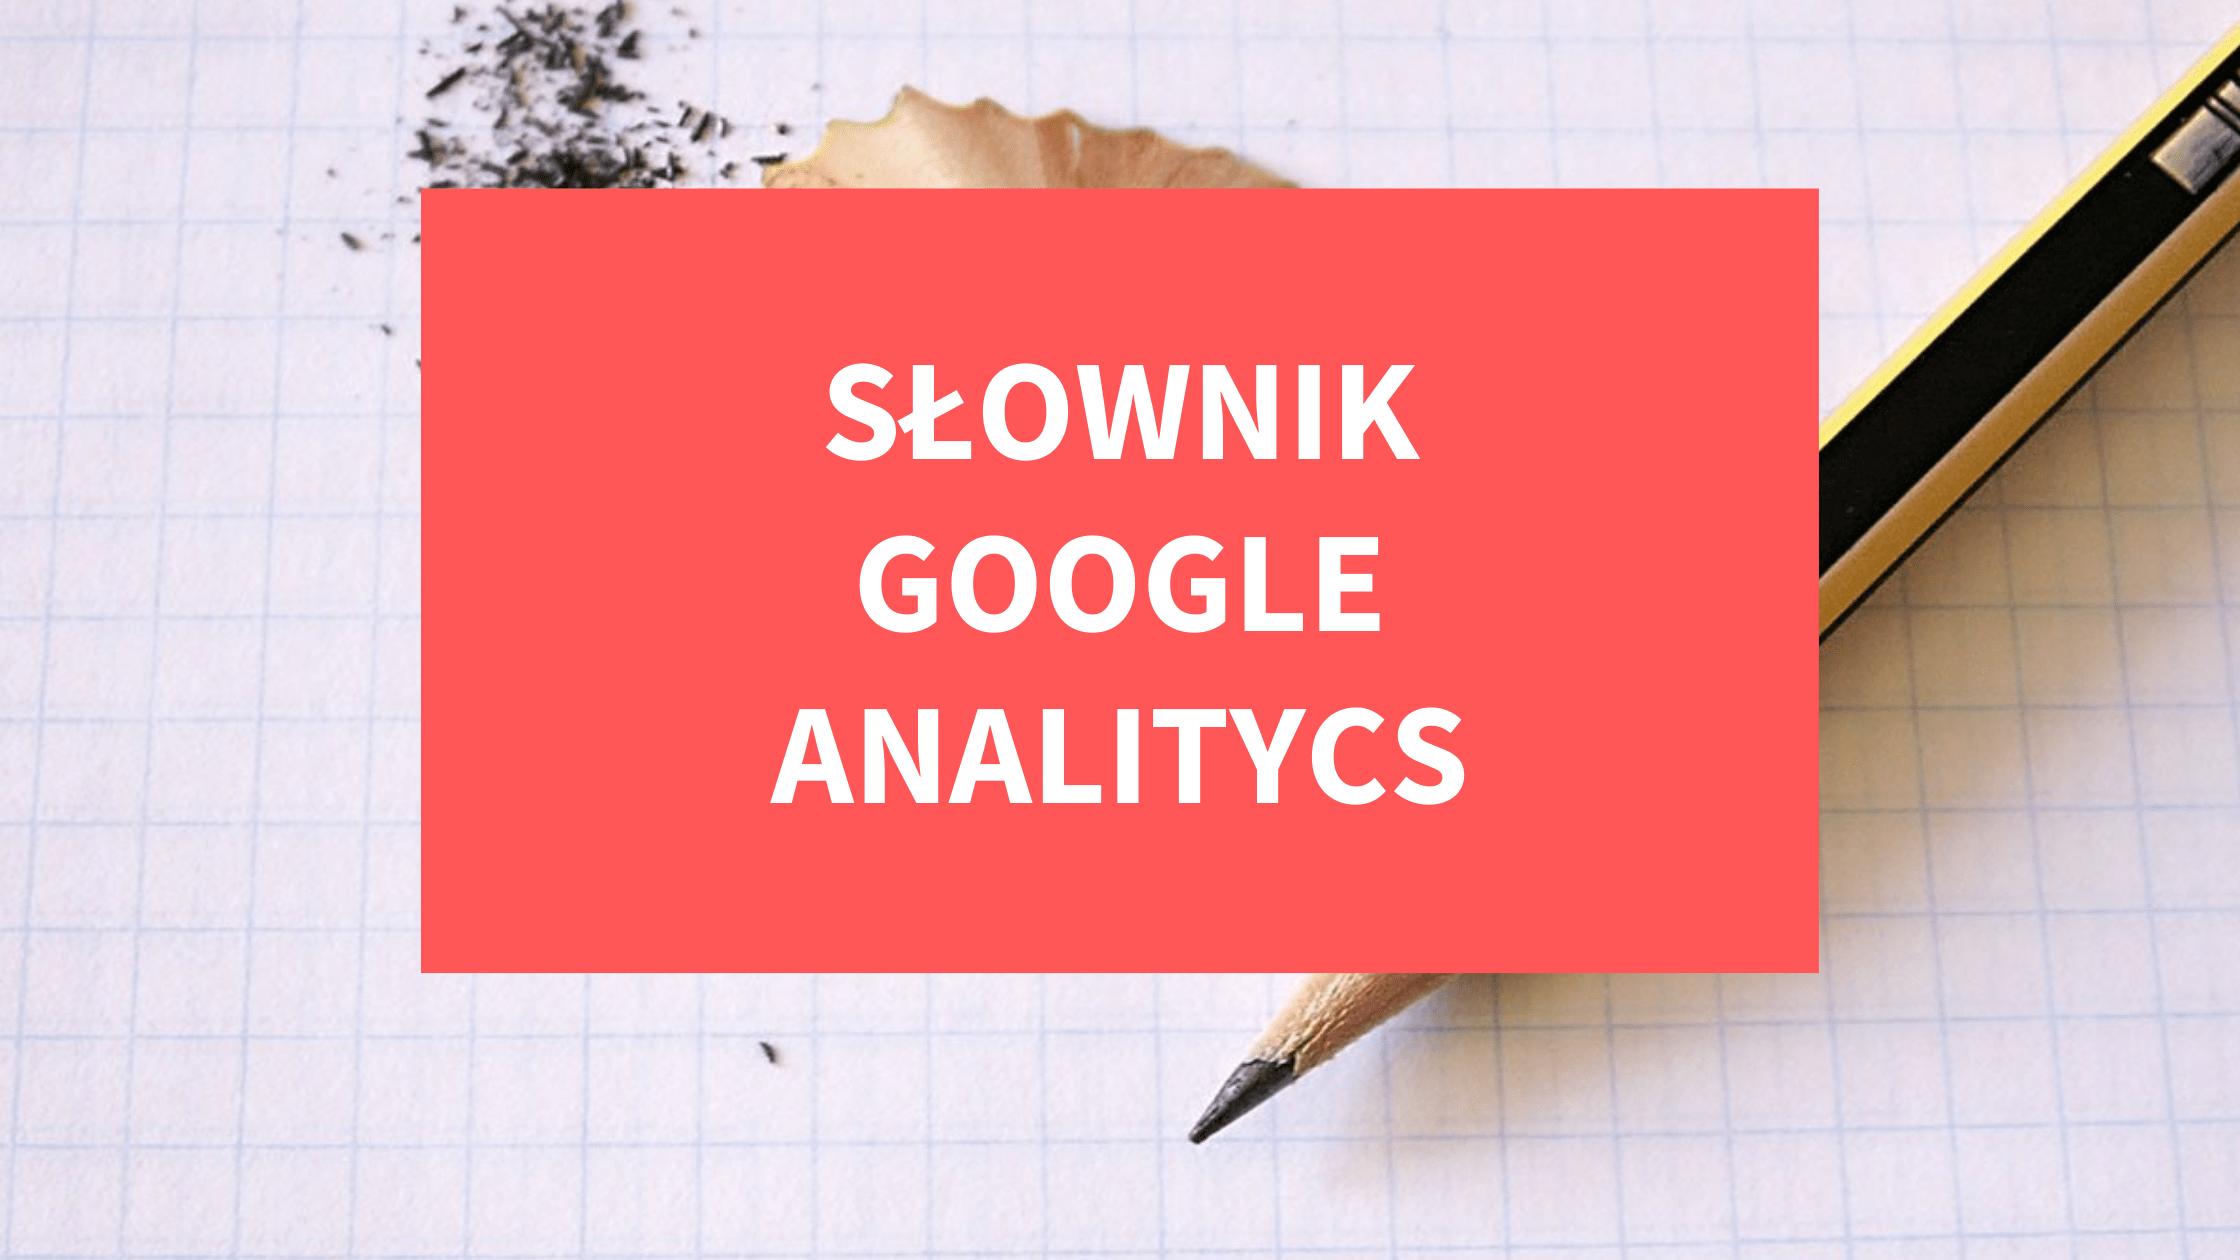 Słownik Google Analitycs